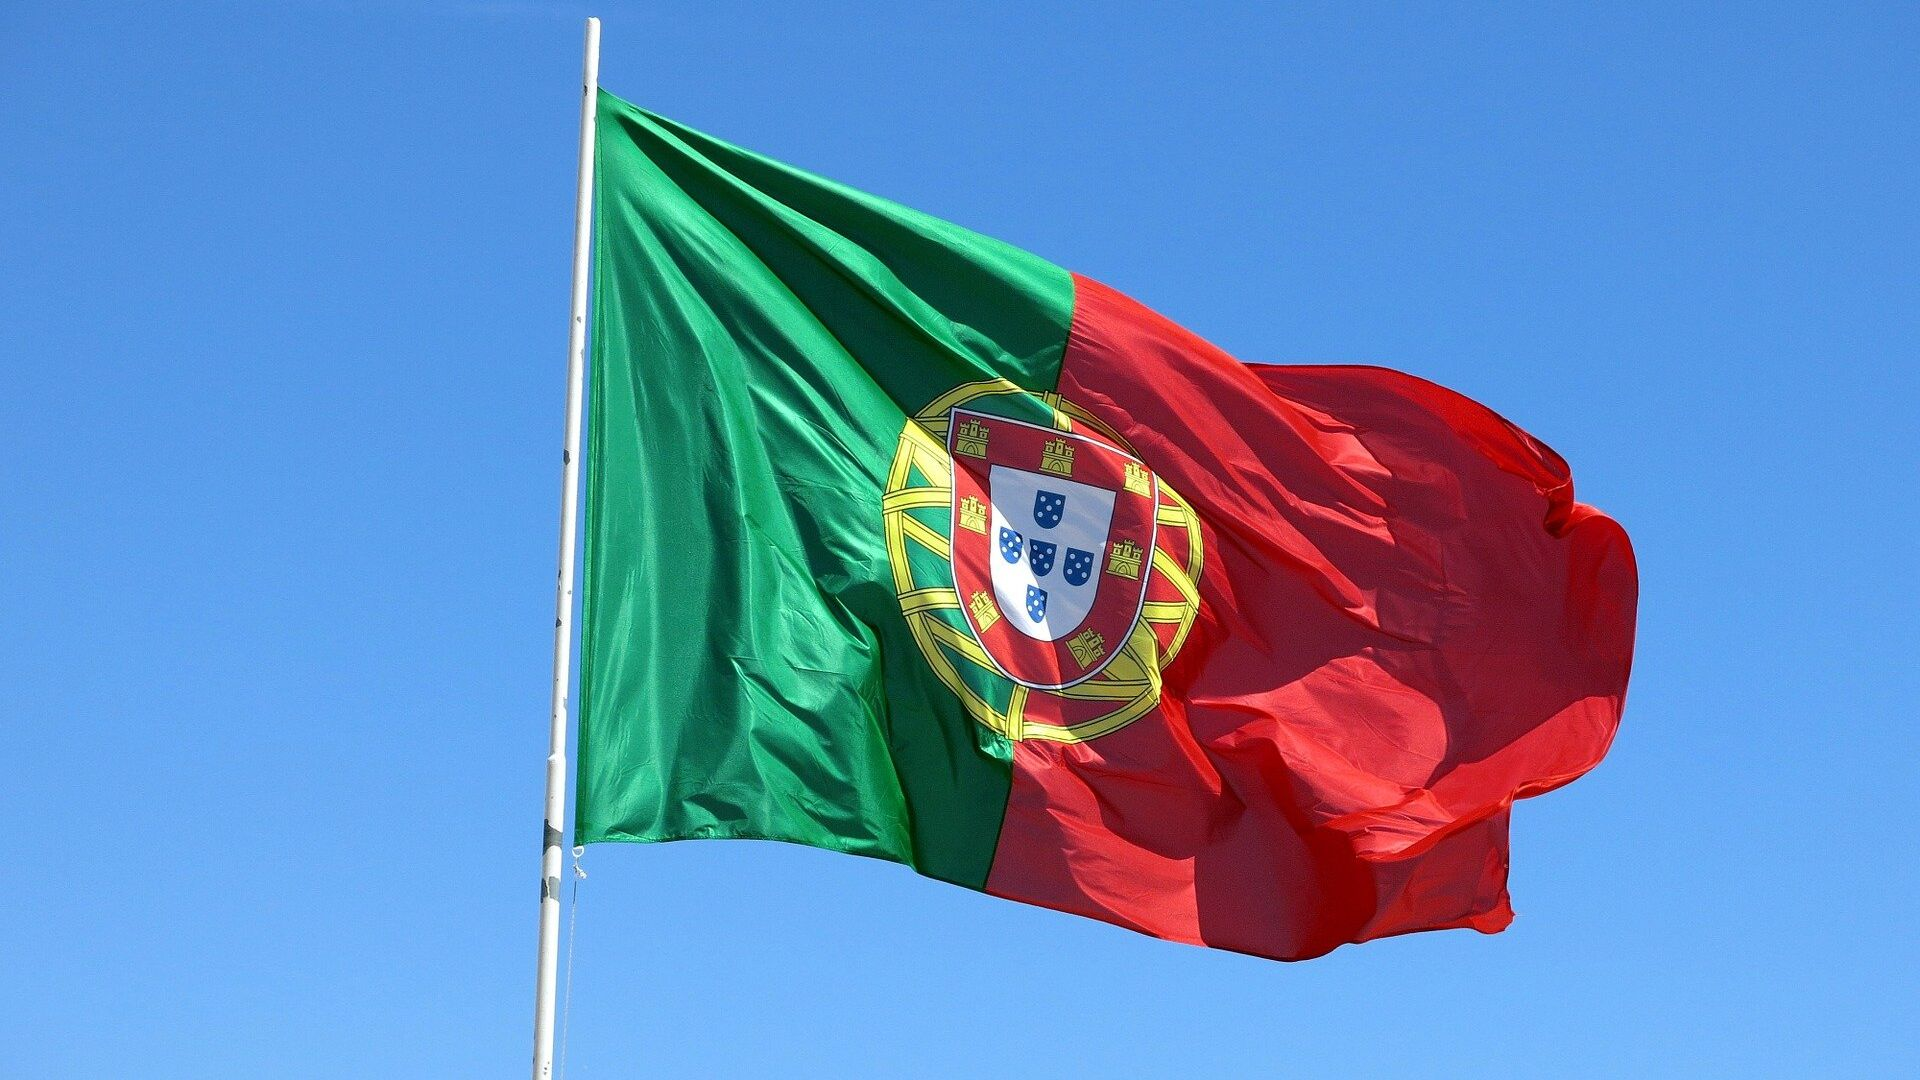 Bandera de Portugal - Sputnik Mundo, 1920, 14.04.2021